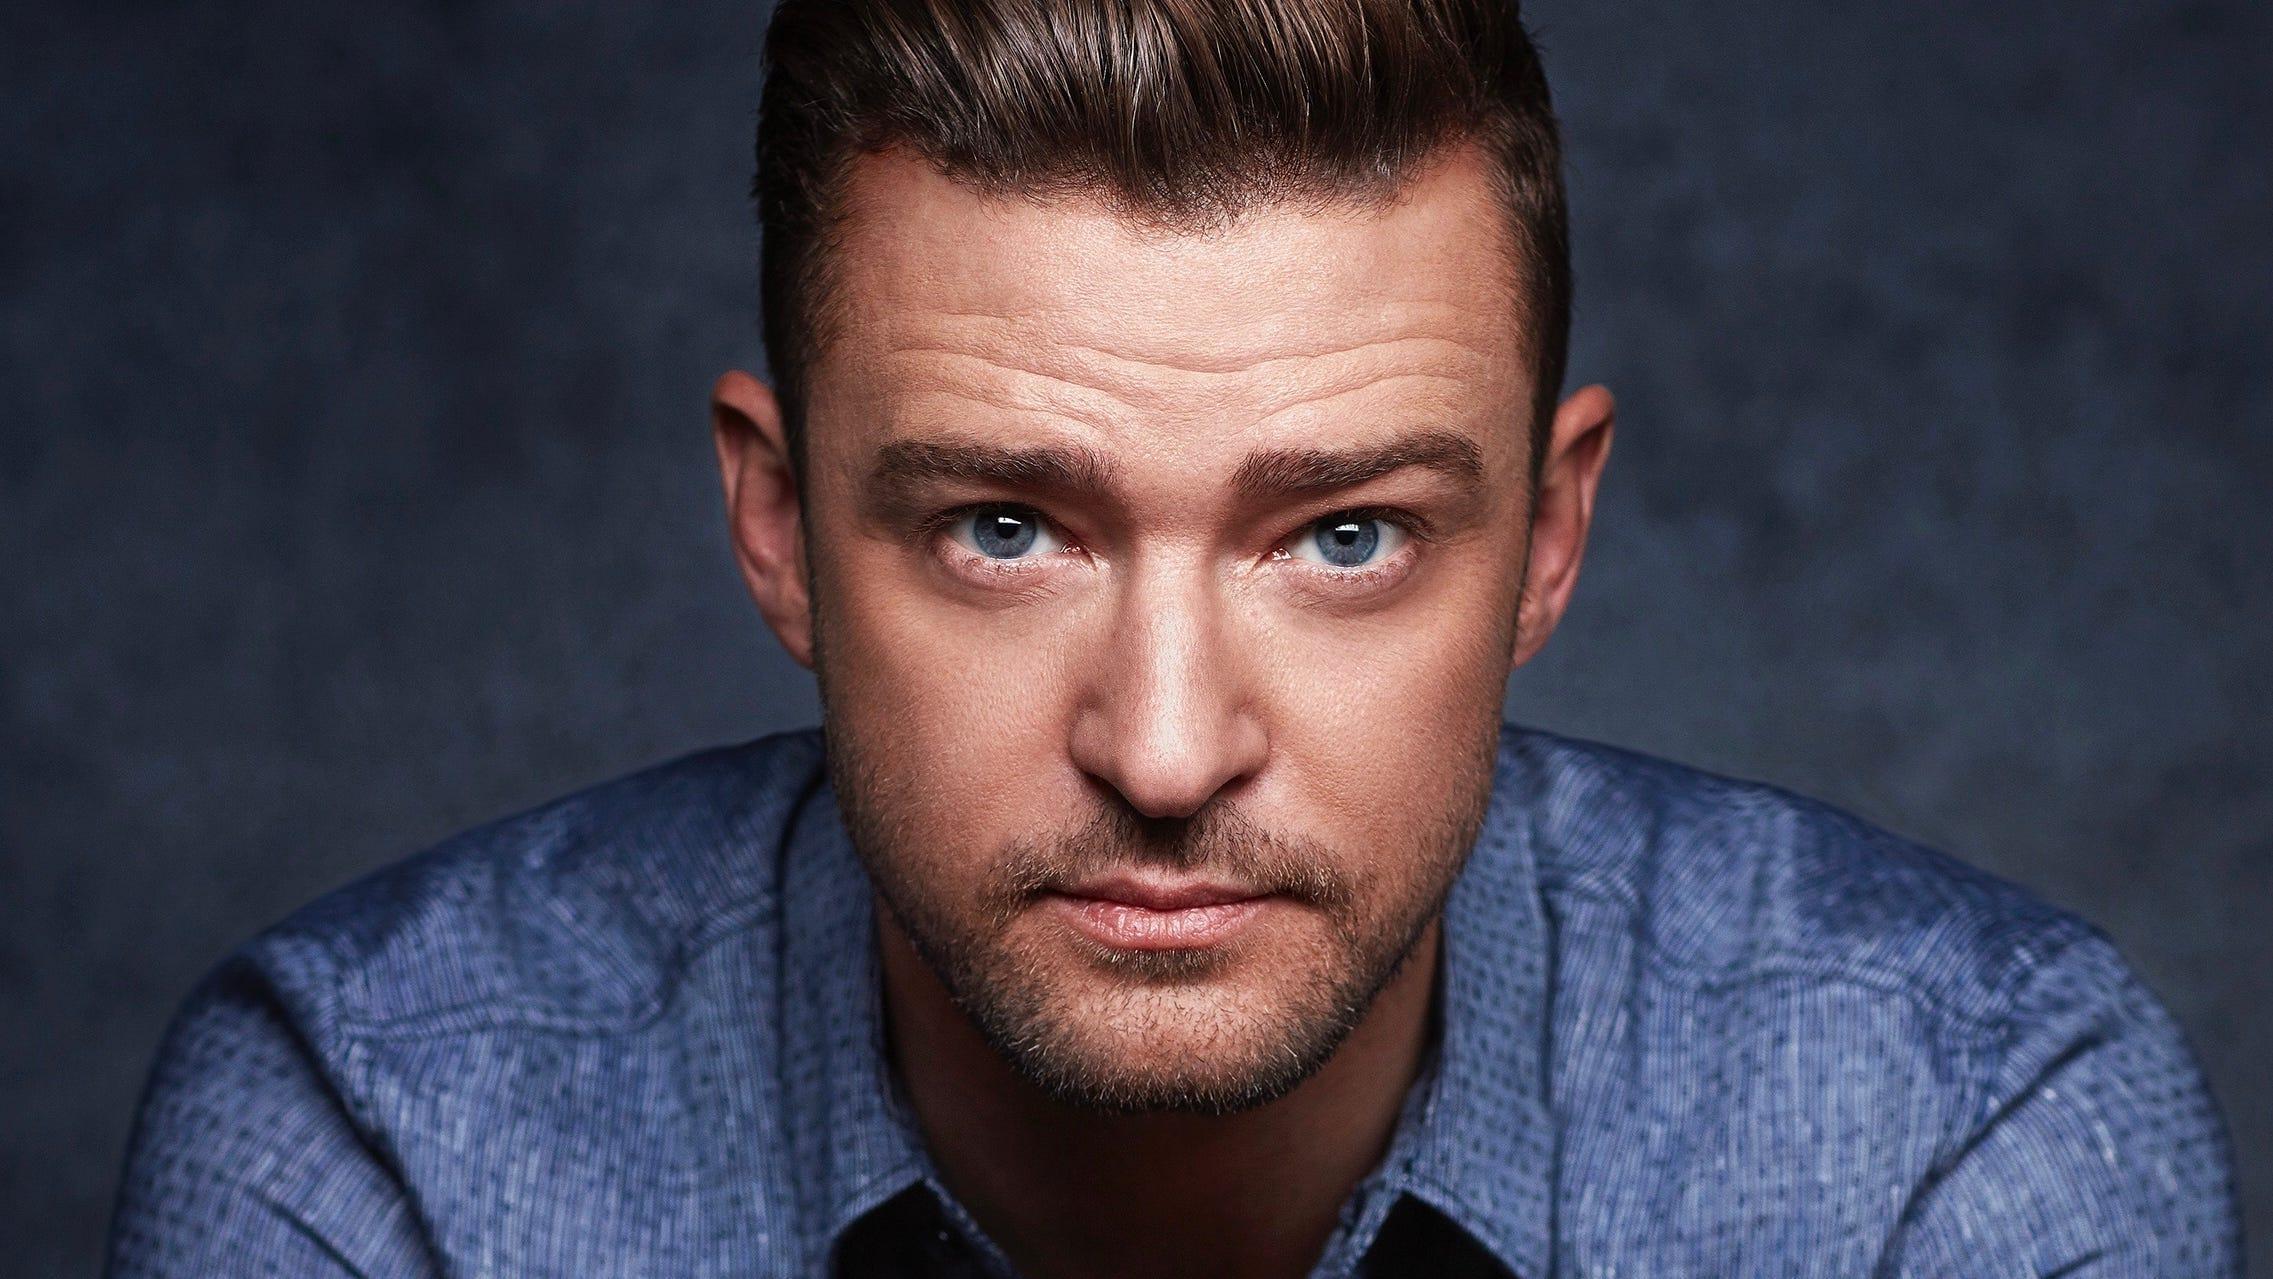 Justin Timberlake Joins Effort To Bring Major League Baseball To Nashville